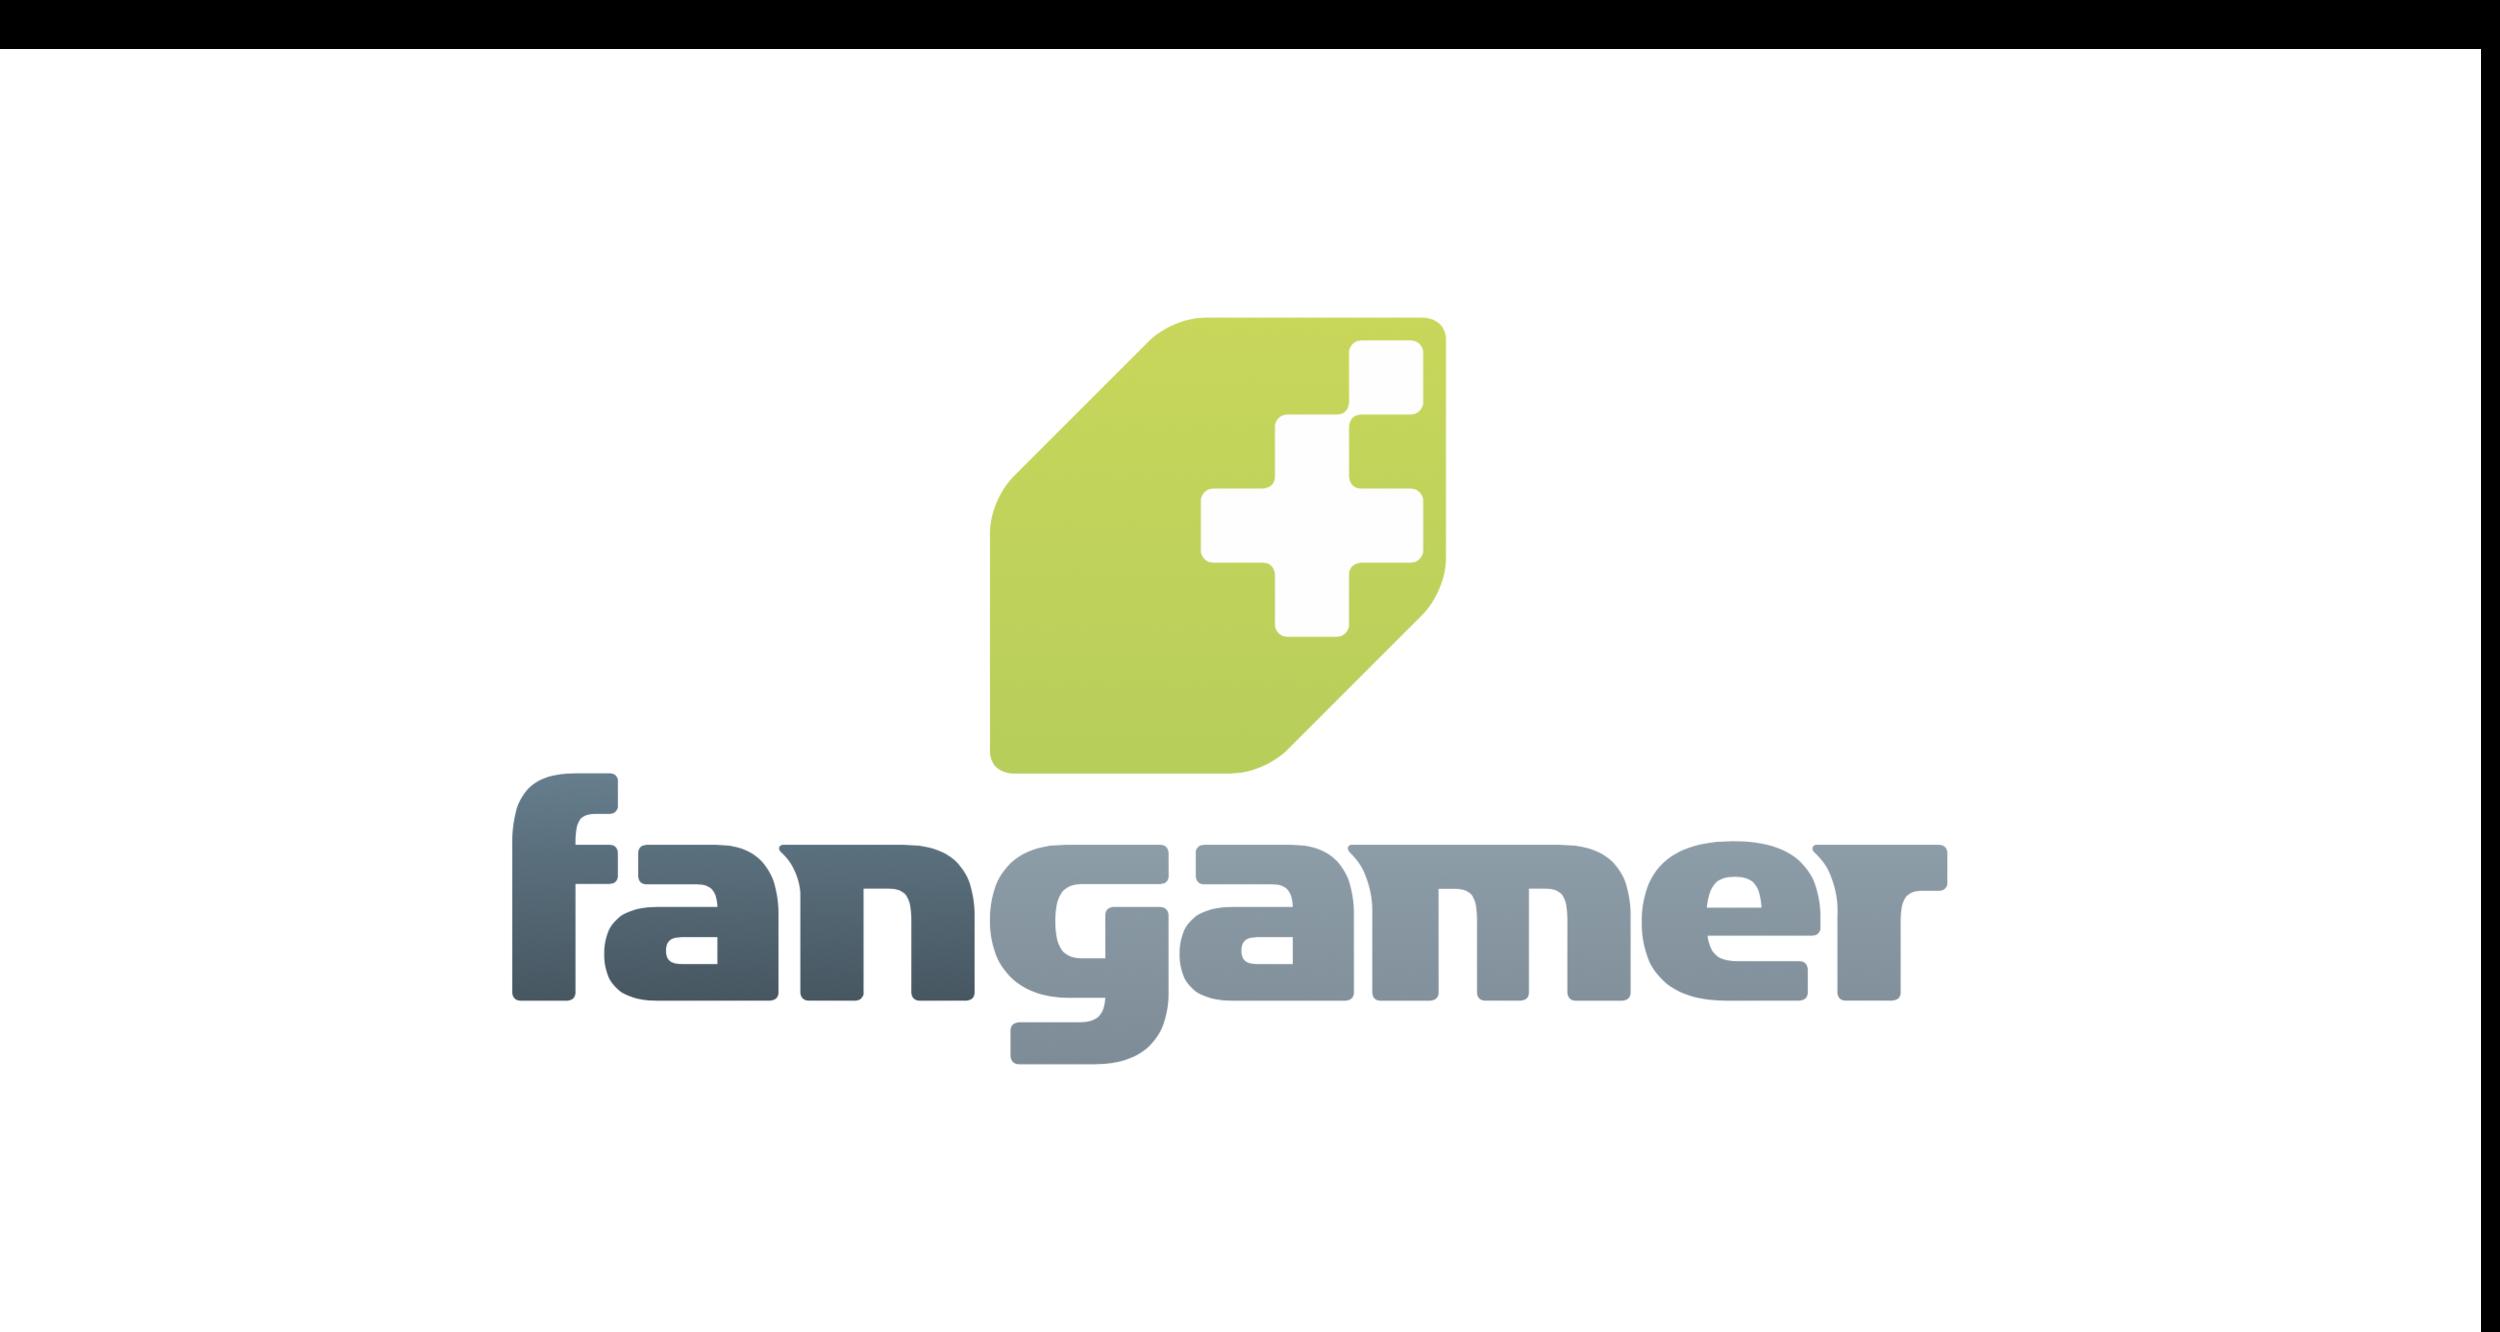 fangamer.png